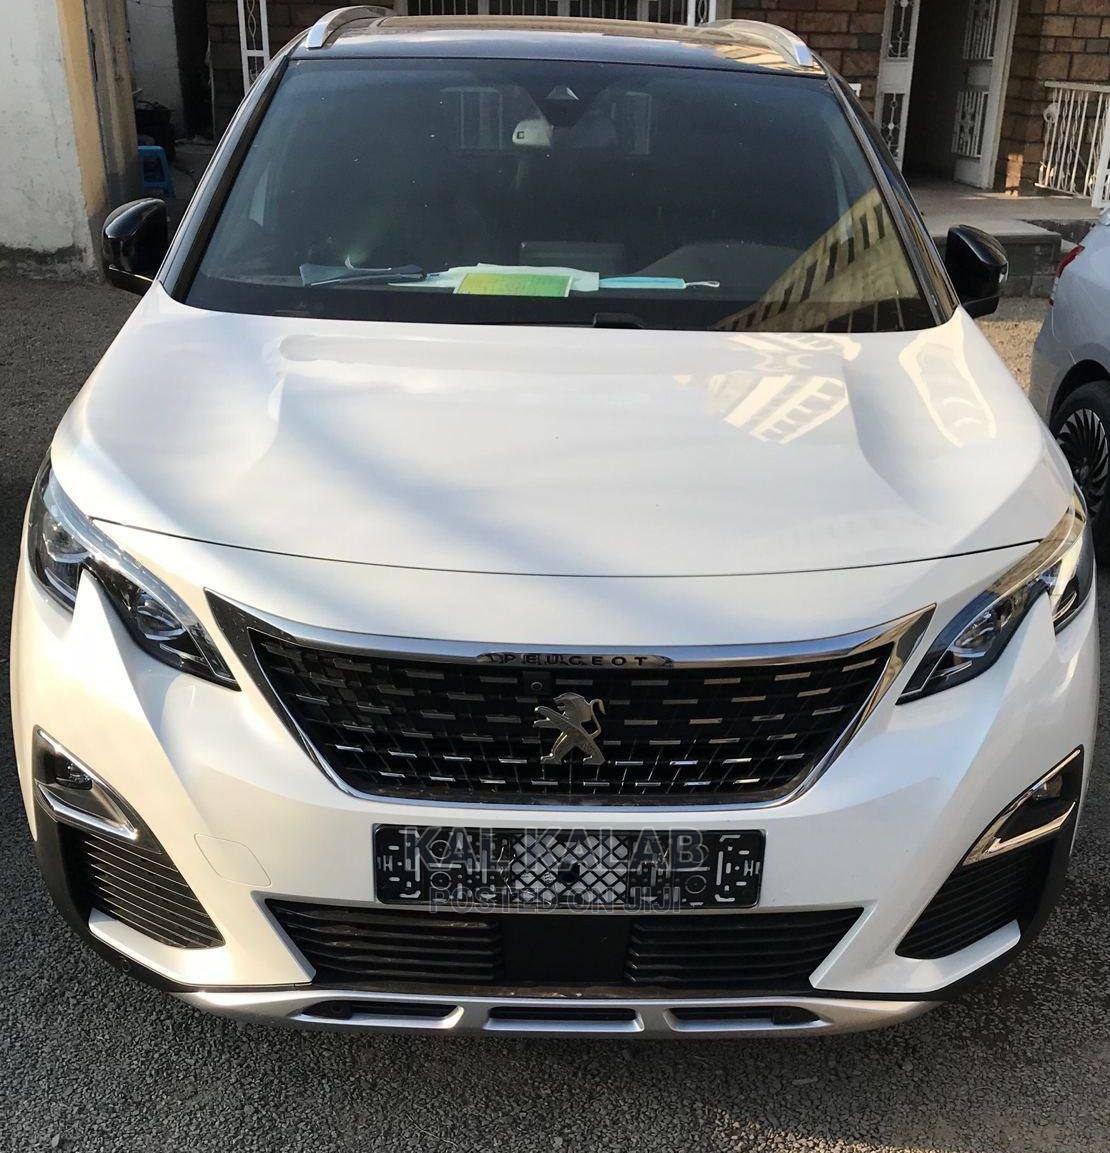 New Peugeot 5008 2020 White   Cars for sale in Bole, Addis Ababa, Ethiopia